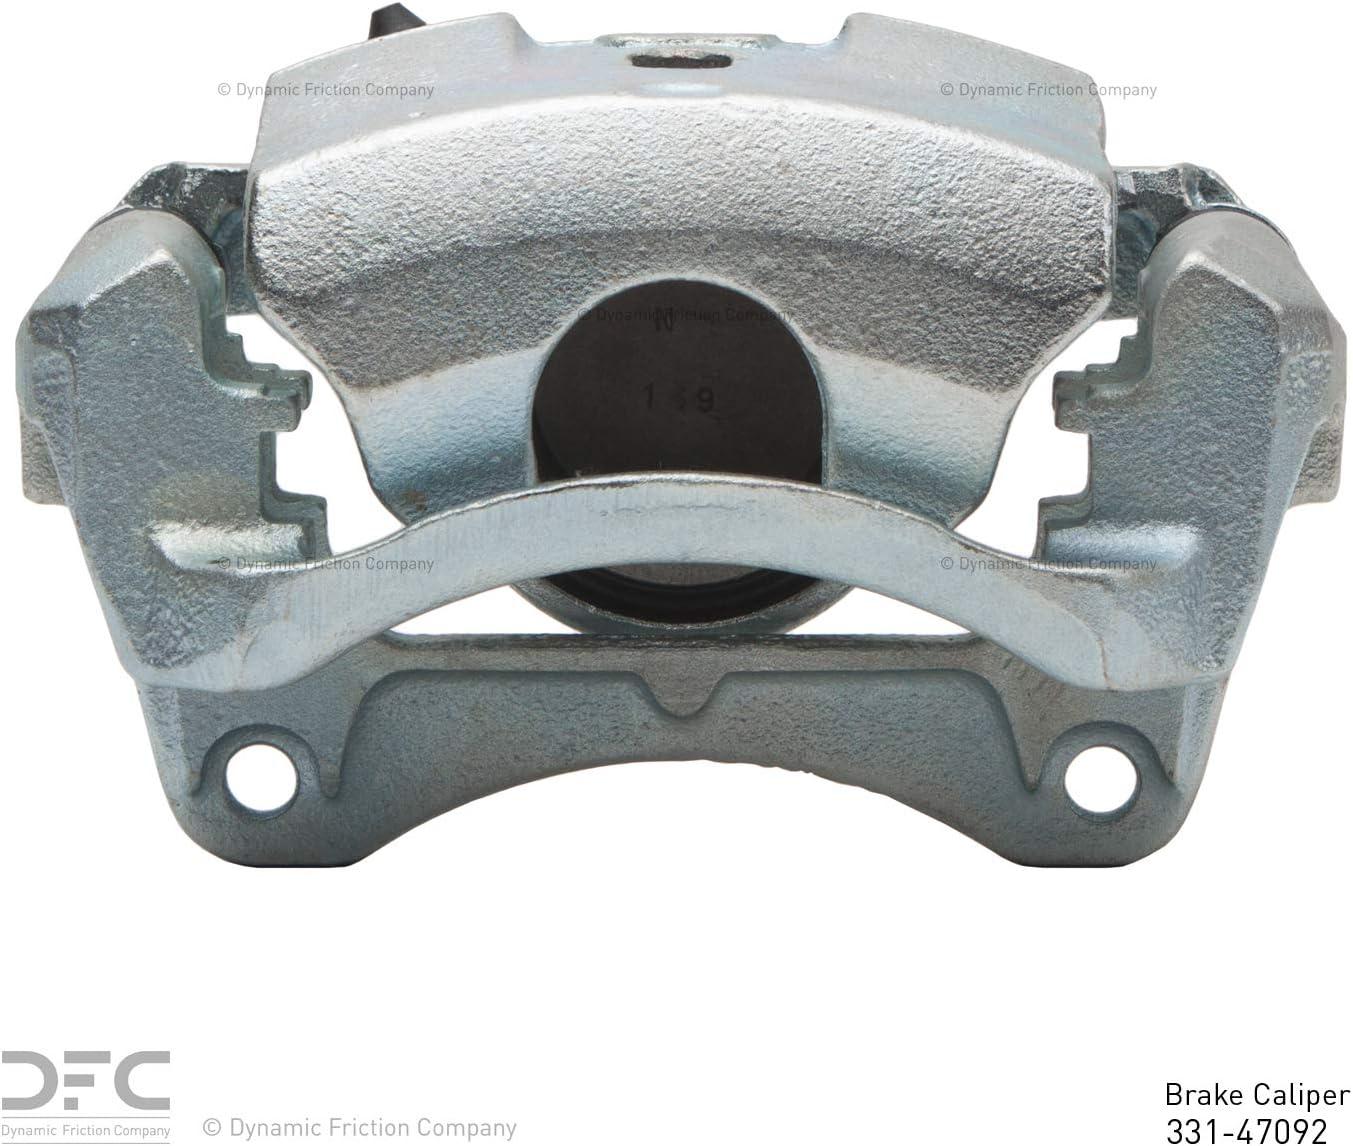 For 2004-2008 Pontiac Malibu Front Right Passenger Side Zinc Disc Brake Caliper